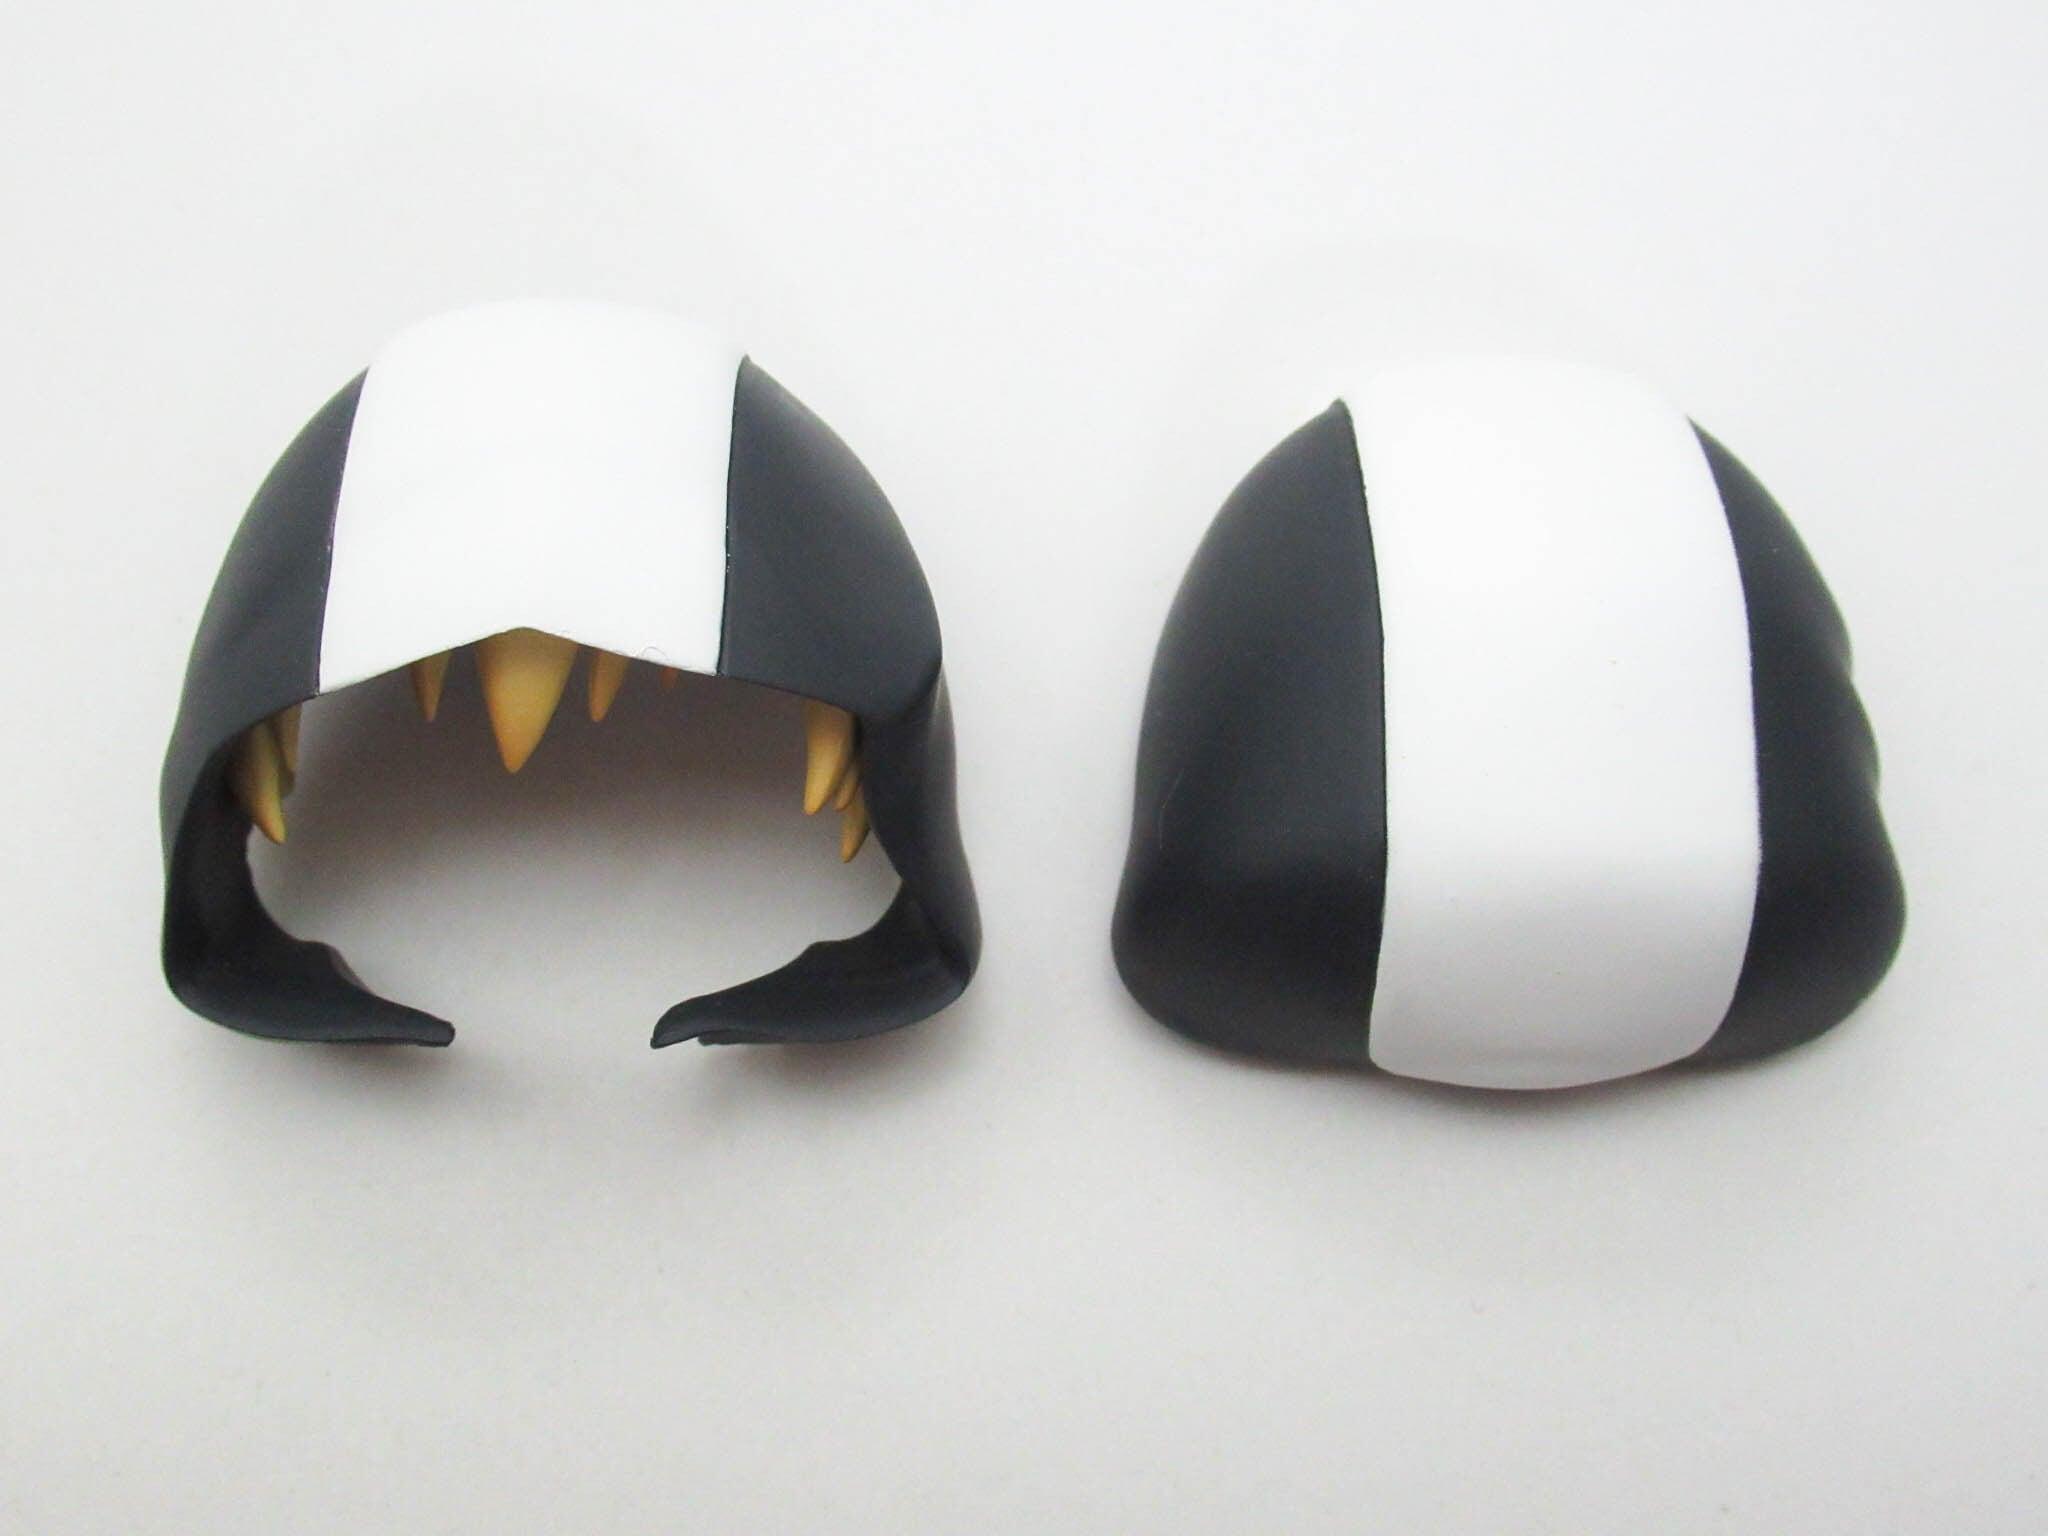 ※【842DX】 アーサー・ペンドラゴン(プロトタイプ)霊基再臨 Ver. 髪パーツ フード付きショート (A-ランク) ねんどろいど